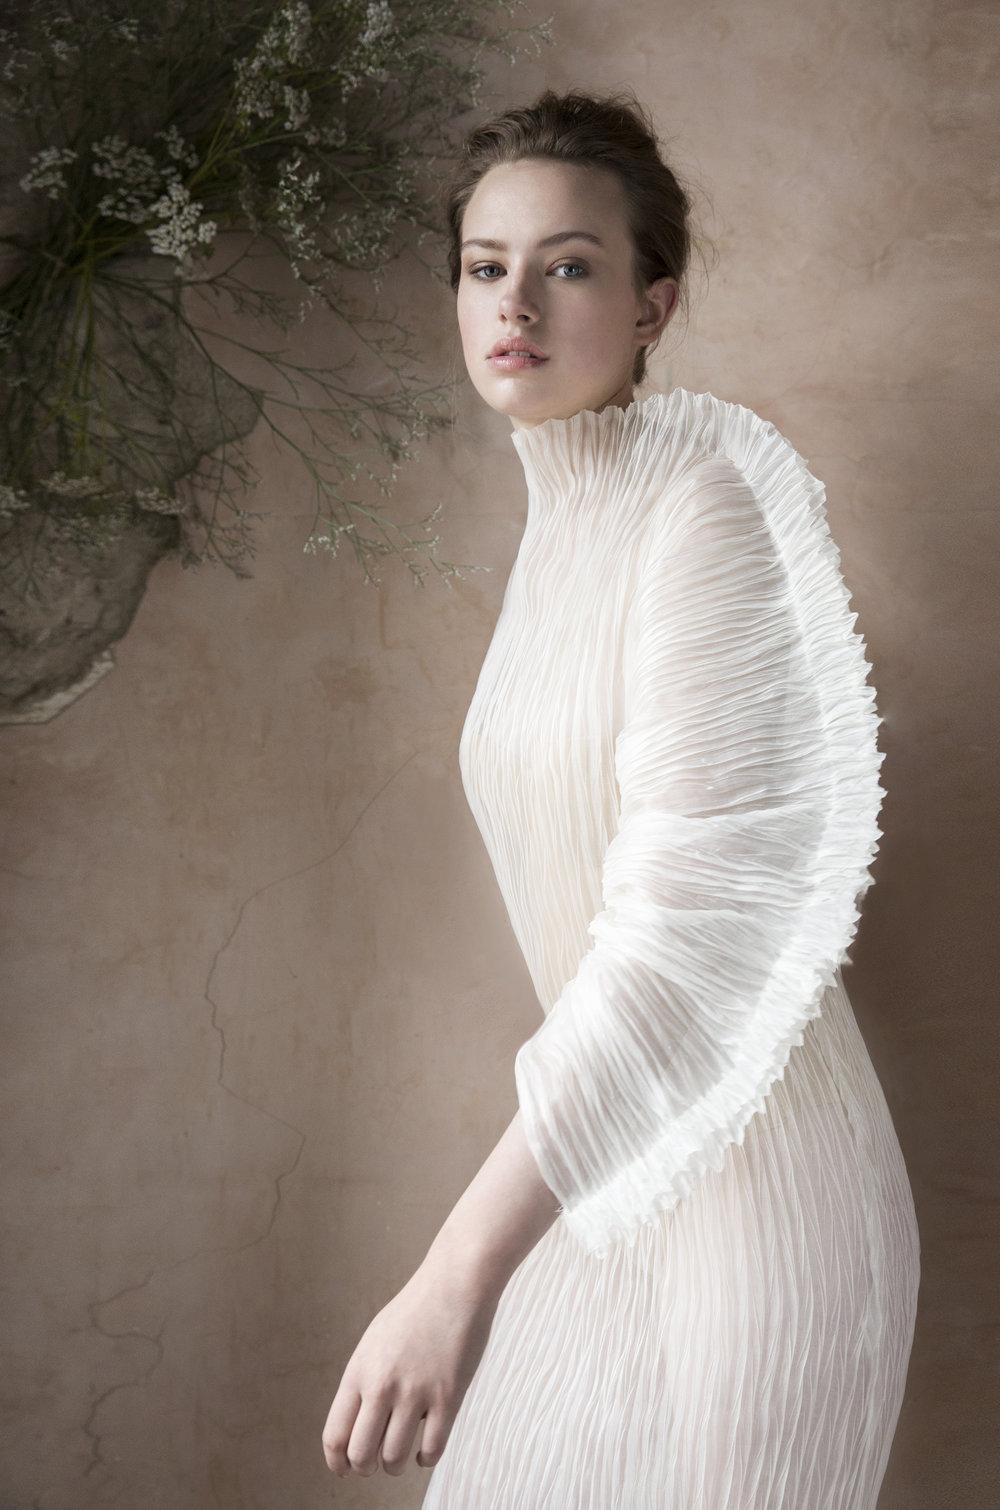 Alison Conneely - Womenswear designer